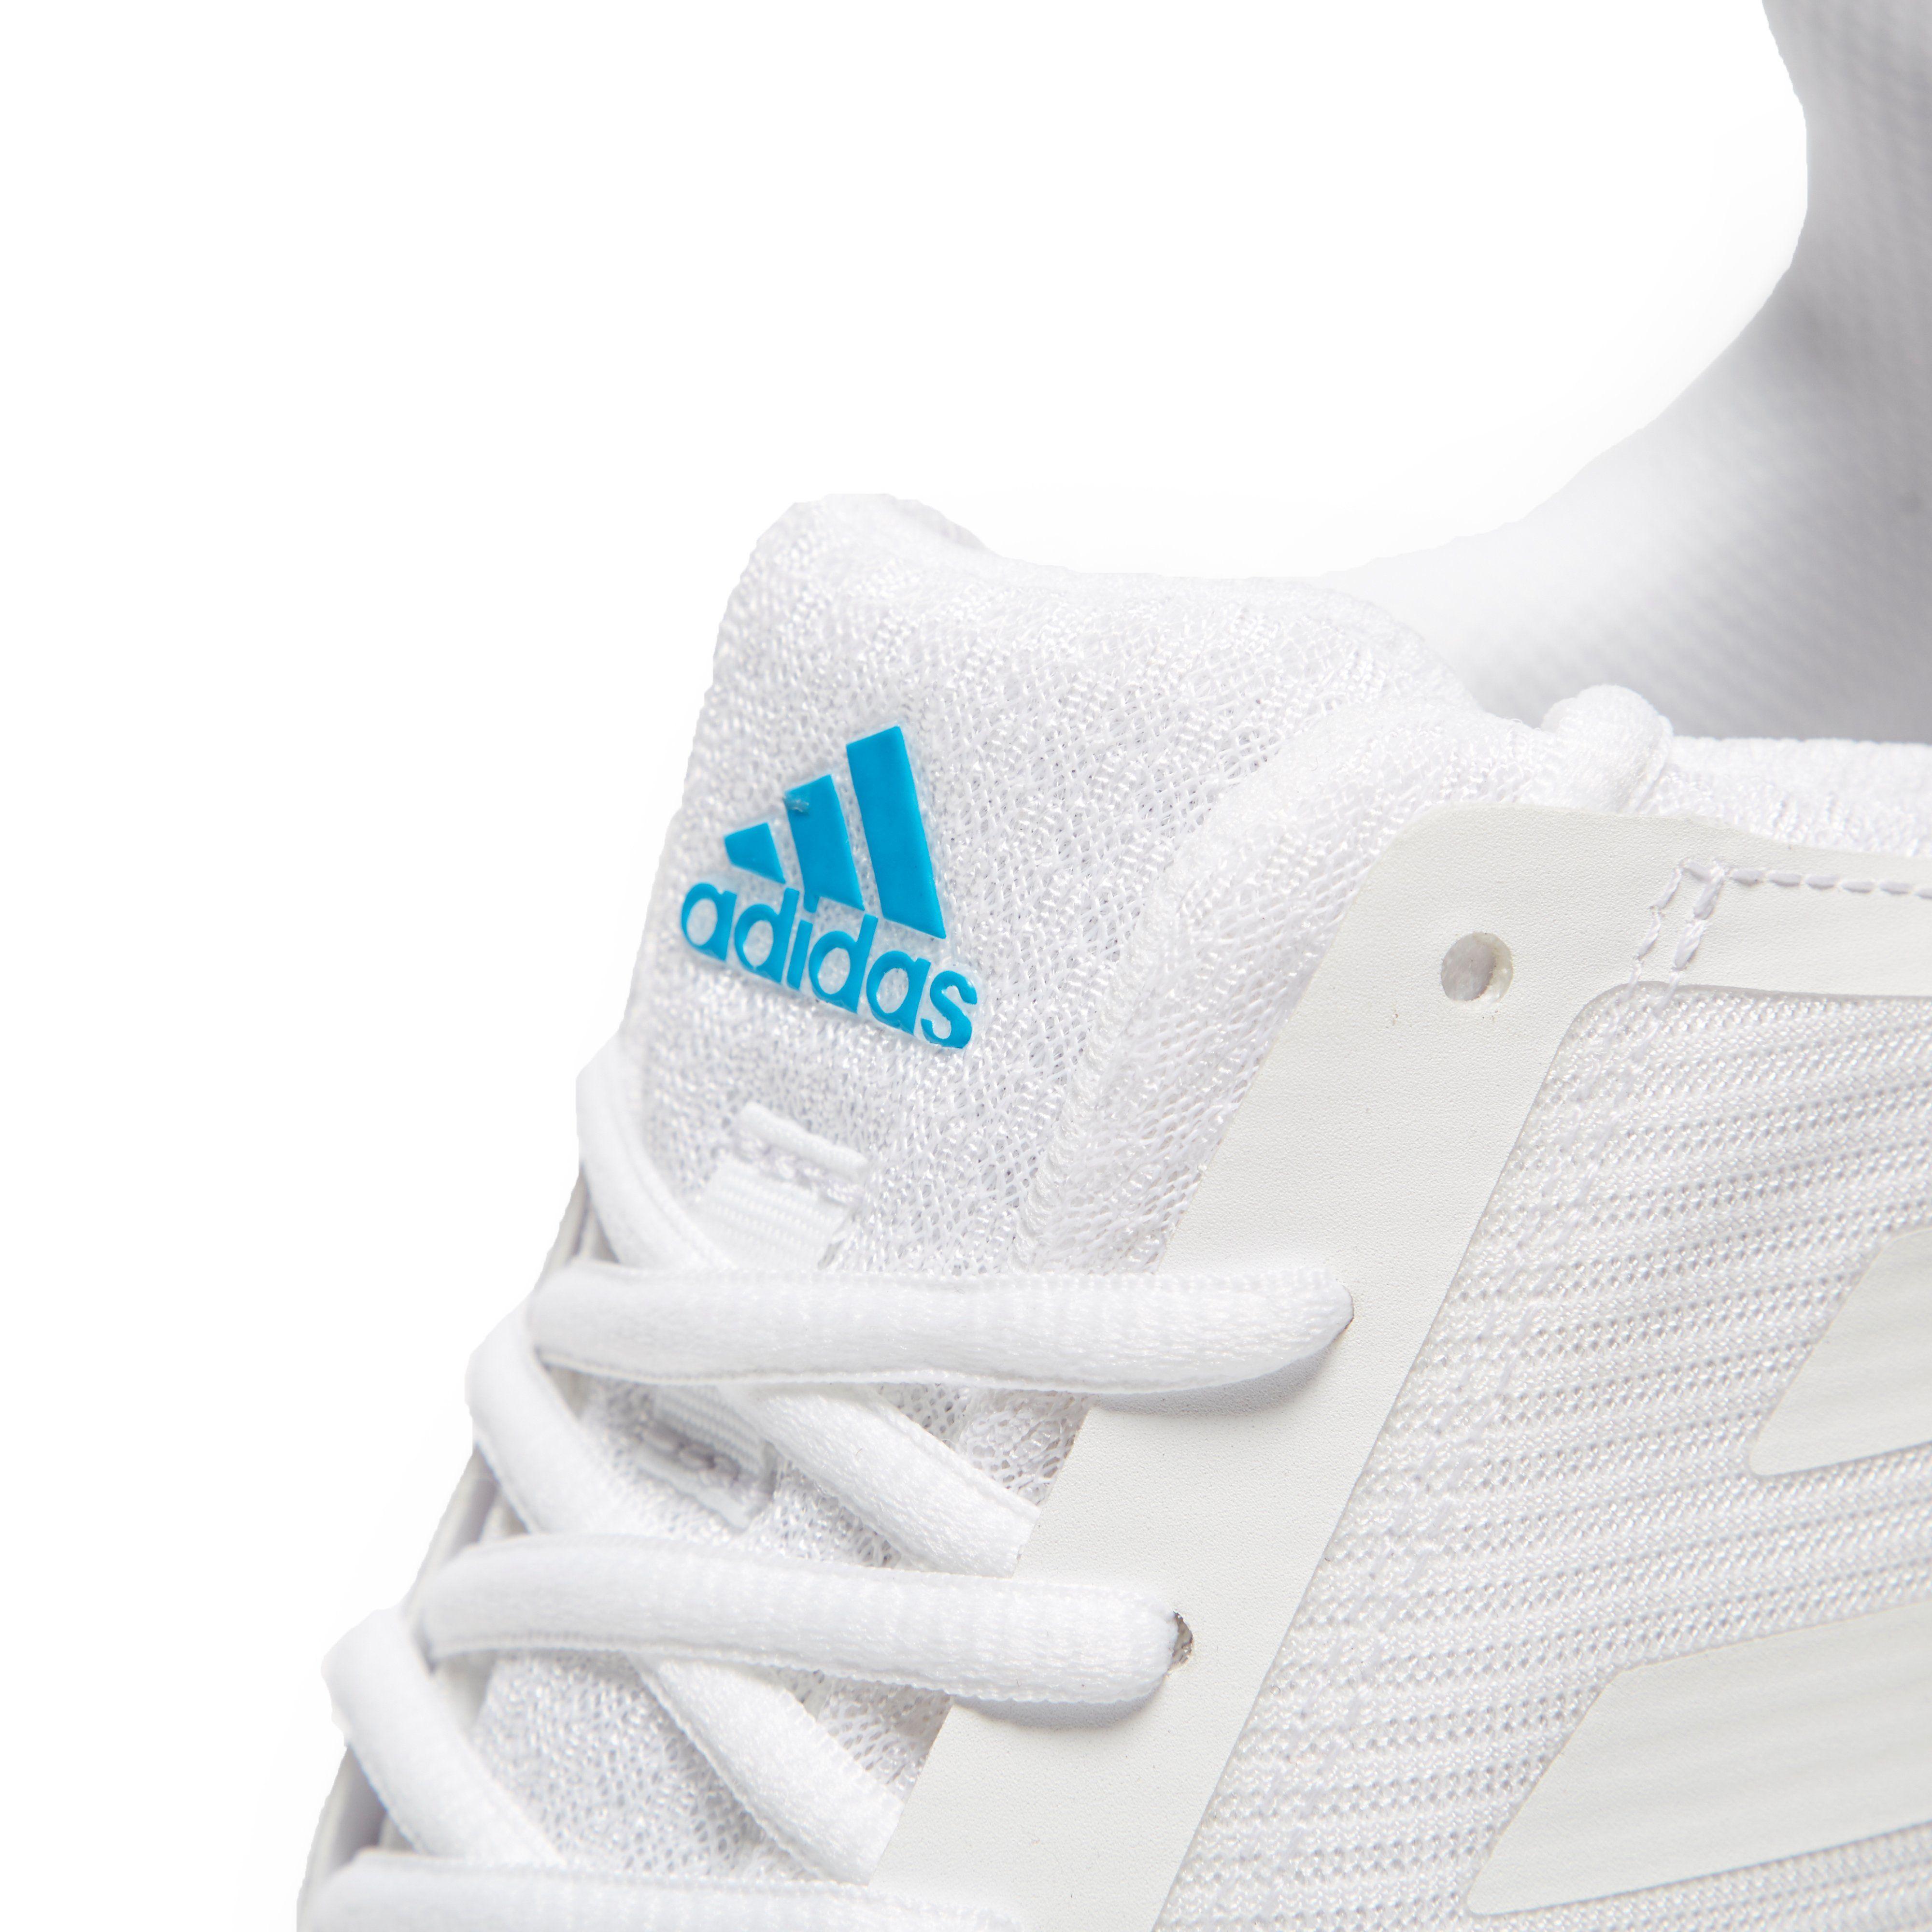 adidas CourtJam Bounce Men's Tennis Shoes